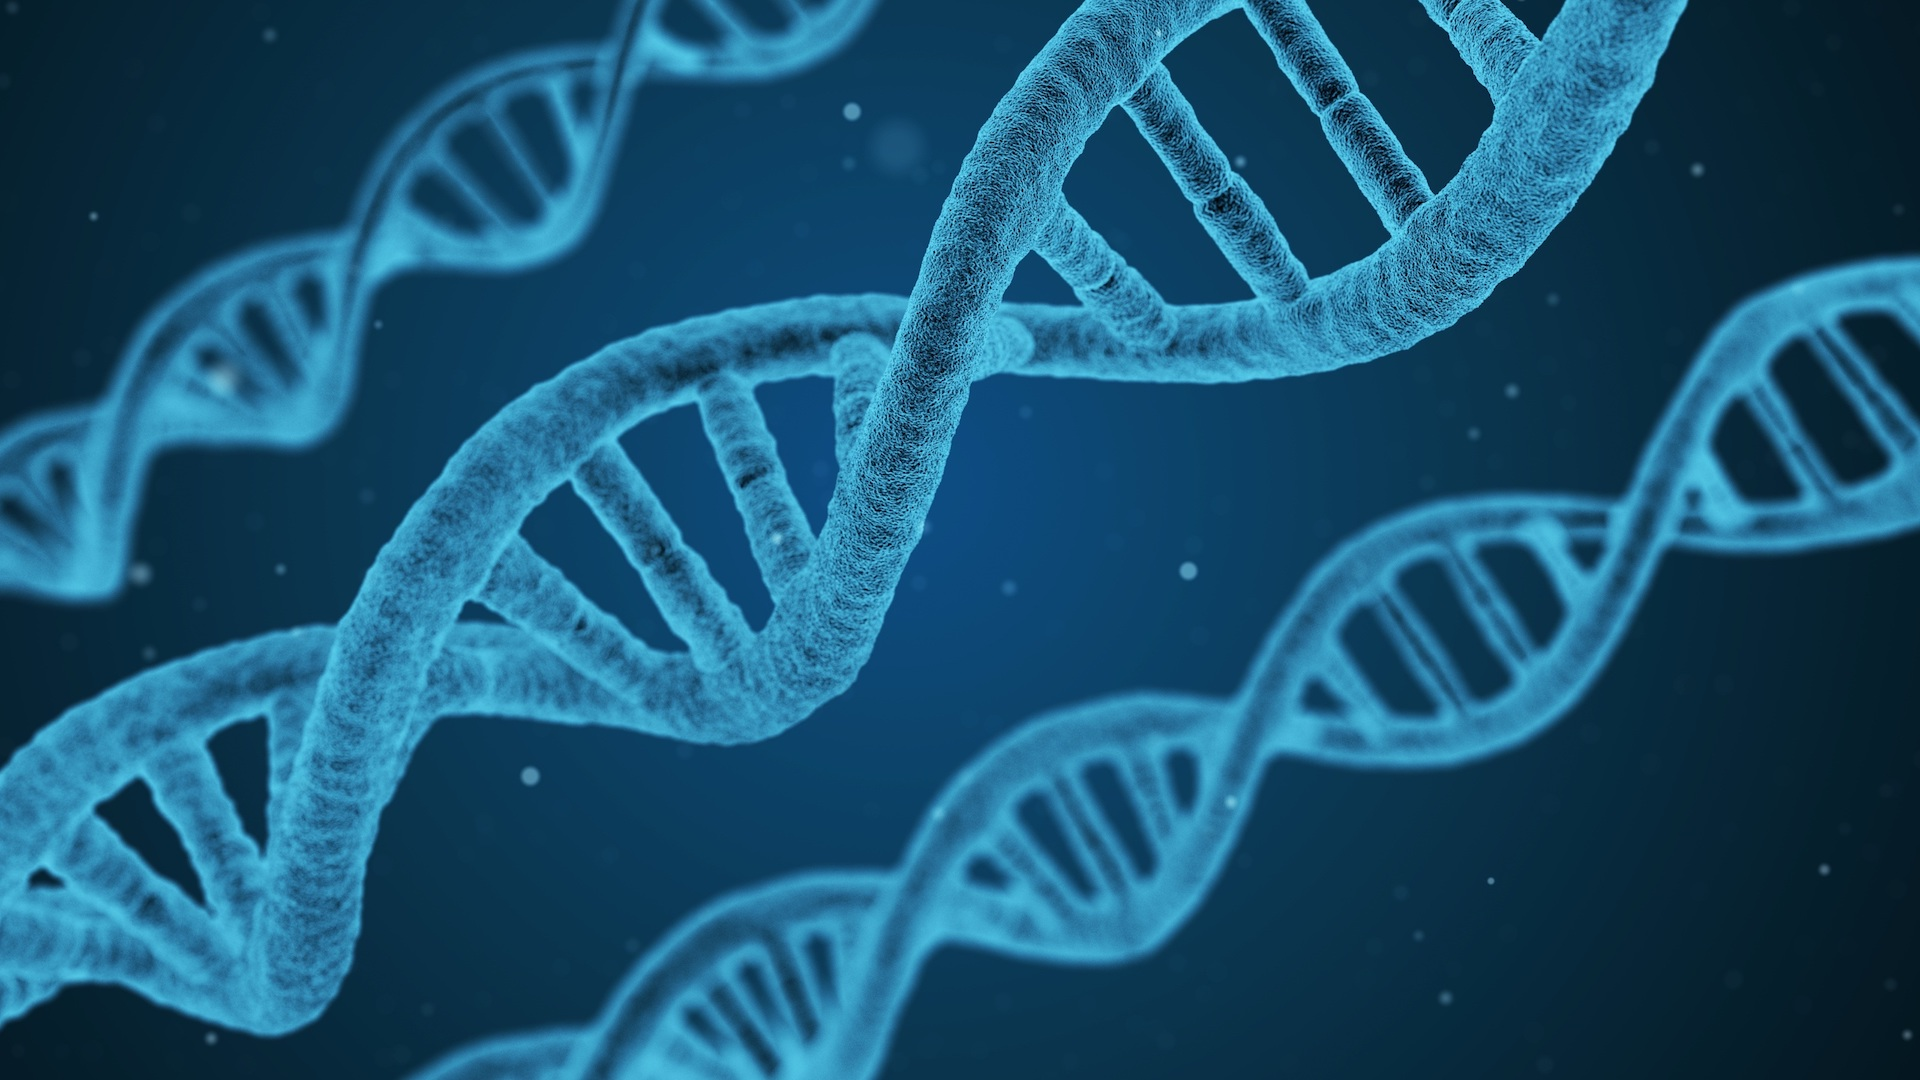 Digital avatars, simulations and genetic material